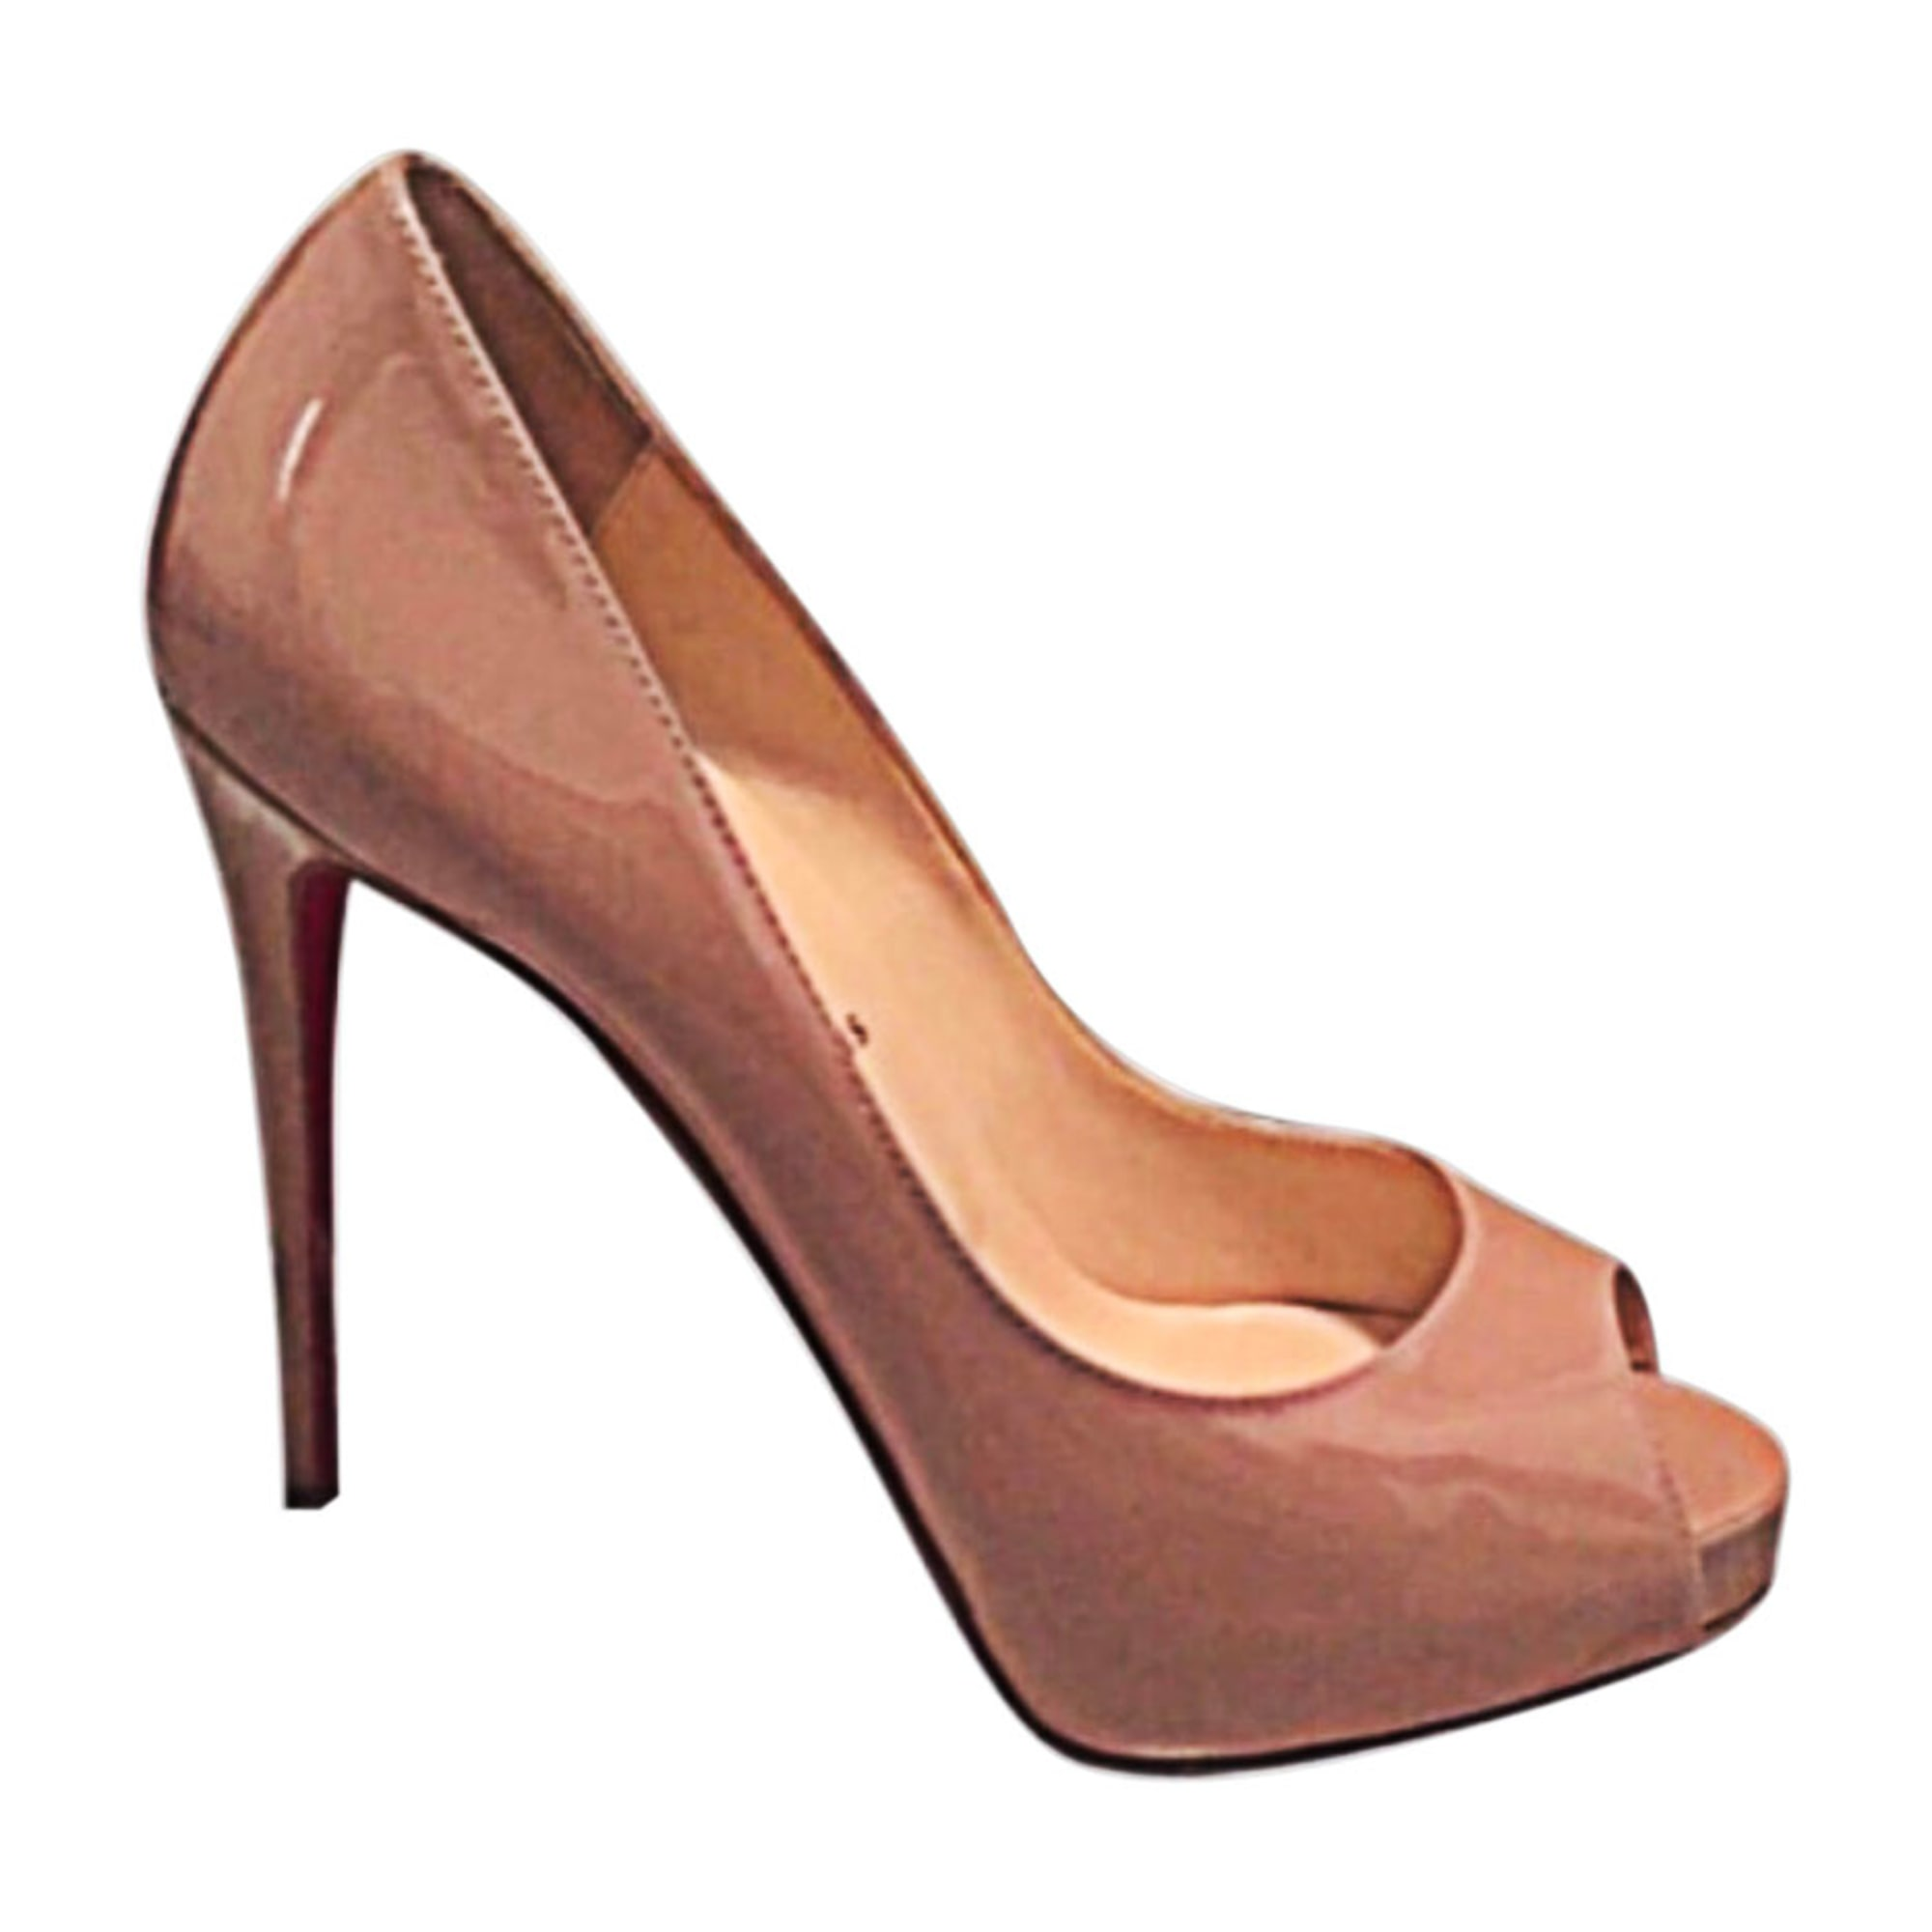 detailed look d691a 6555d promo code louboutin bronze sandals heels a98ee cff9f